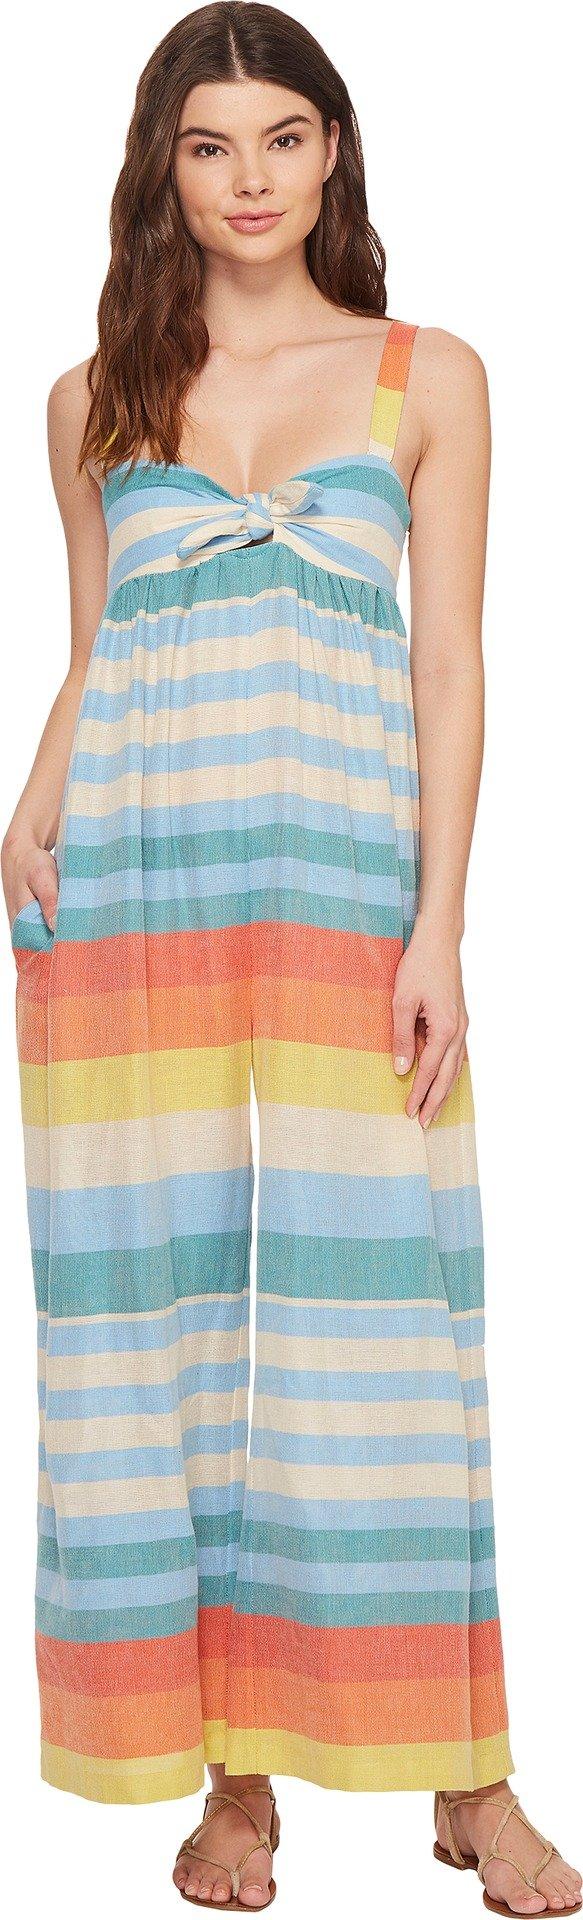 Mara Hoffman Women's Equator Stripe Tie Front Jumpsuit Cover up, Cream Multi, S